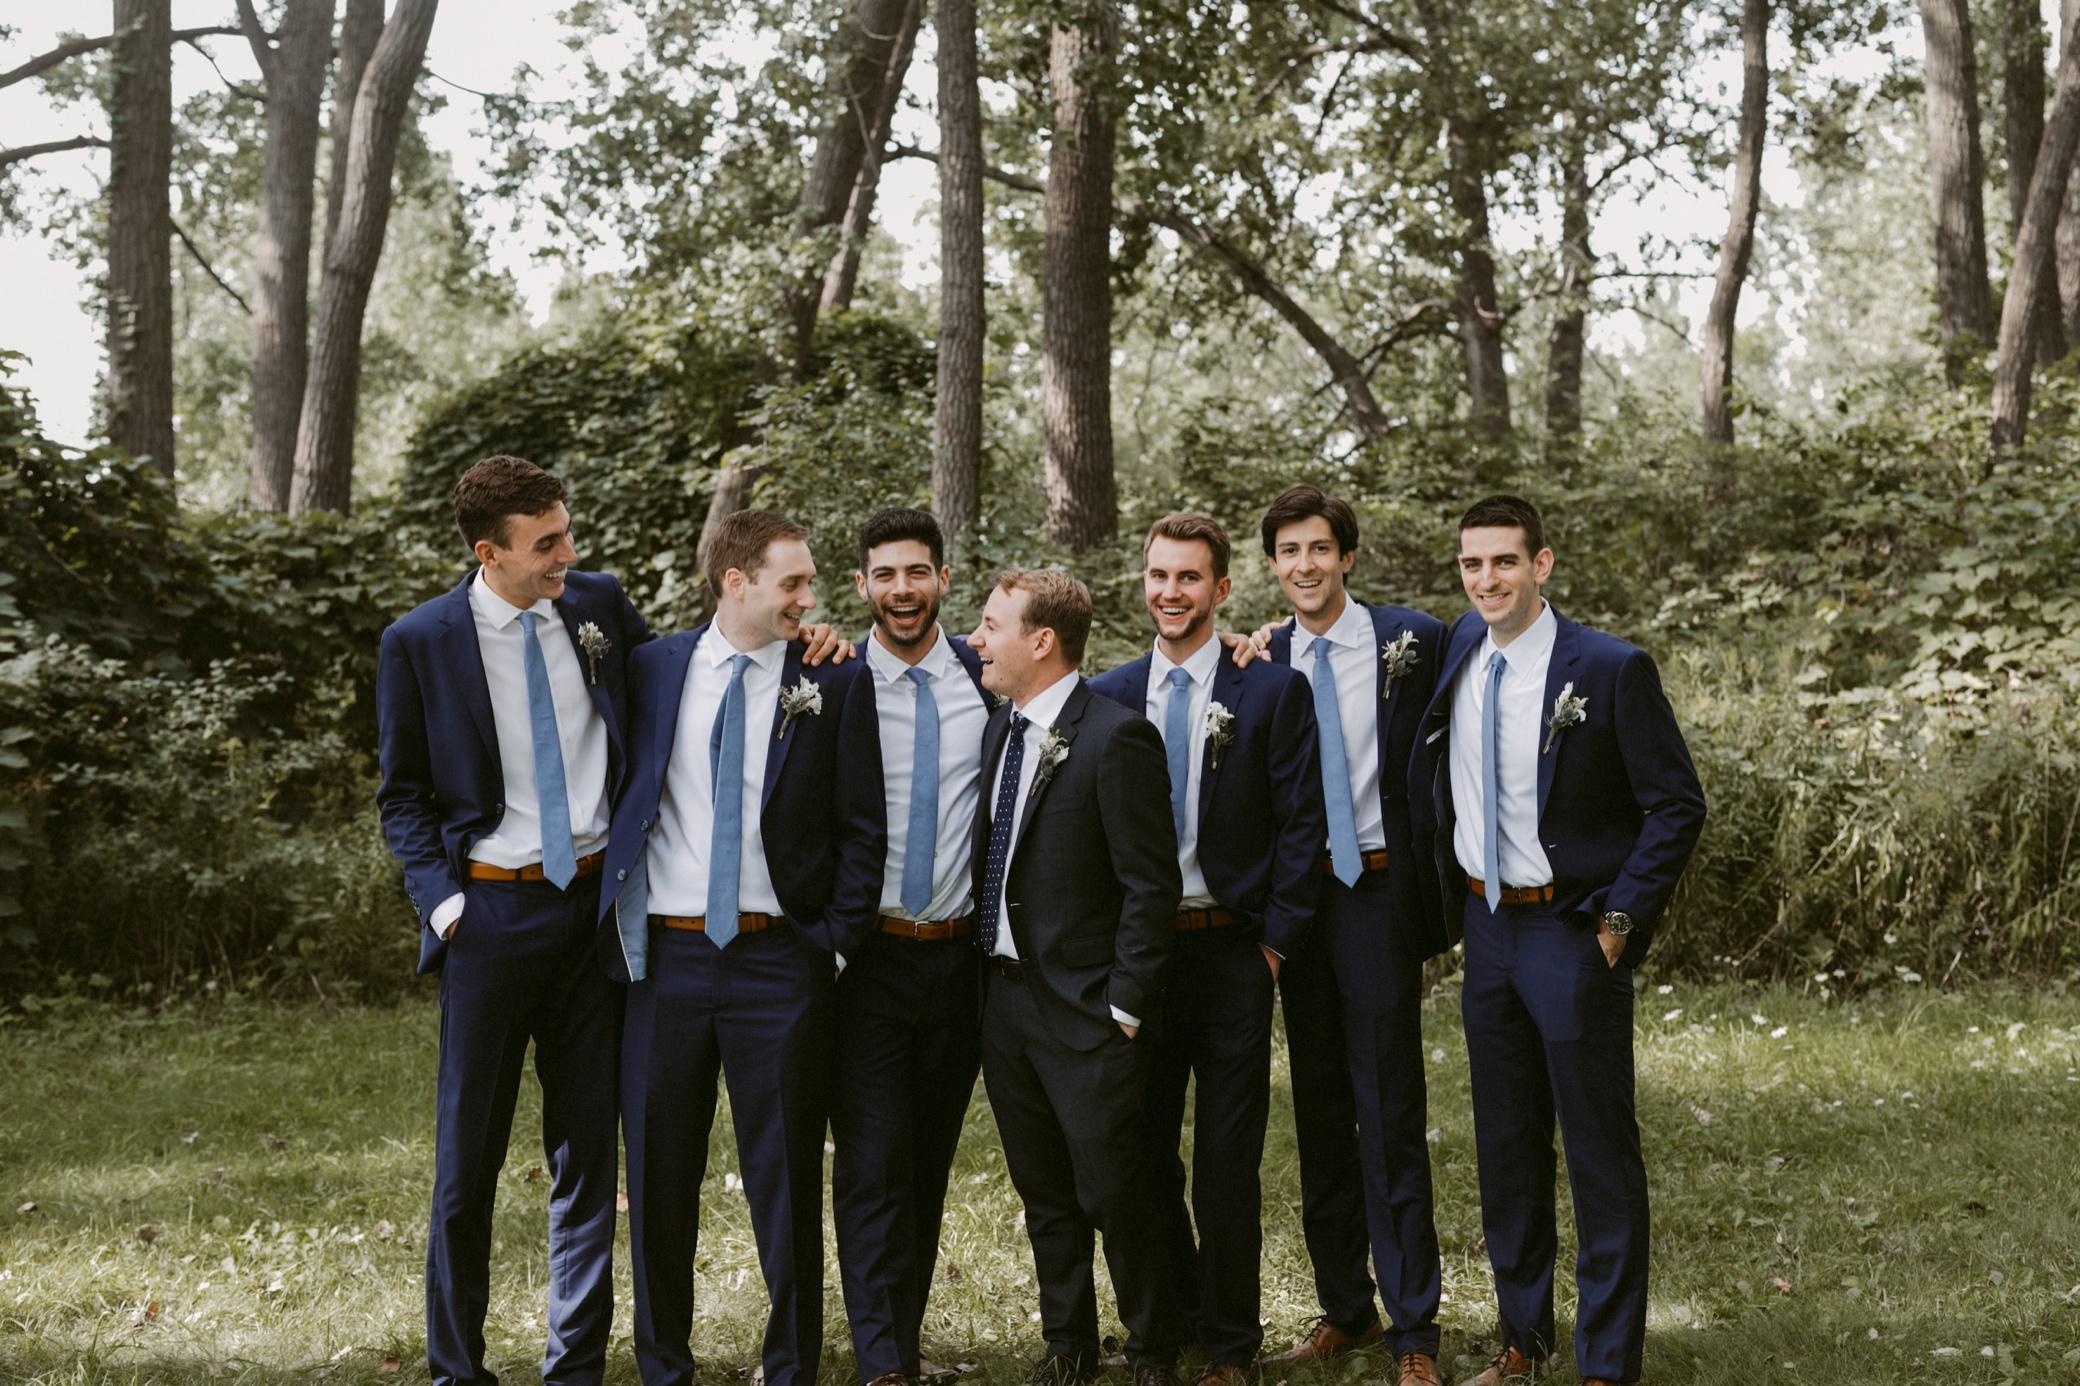 045_The Broadview Hotel Wedding (237 of 913).jpg